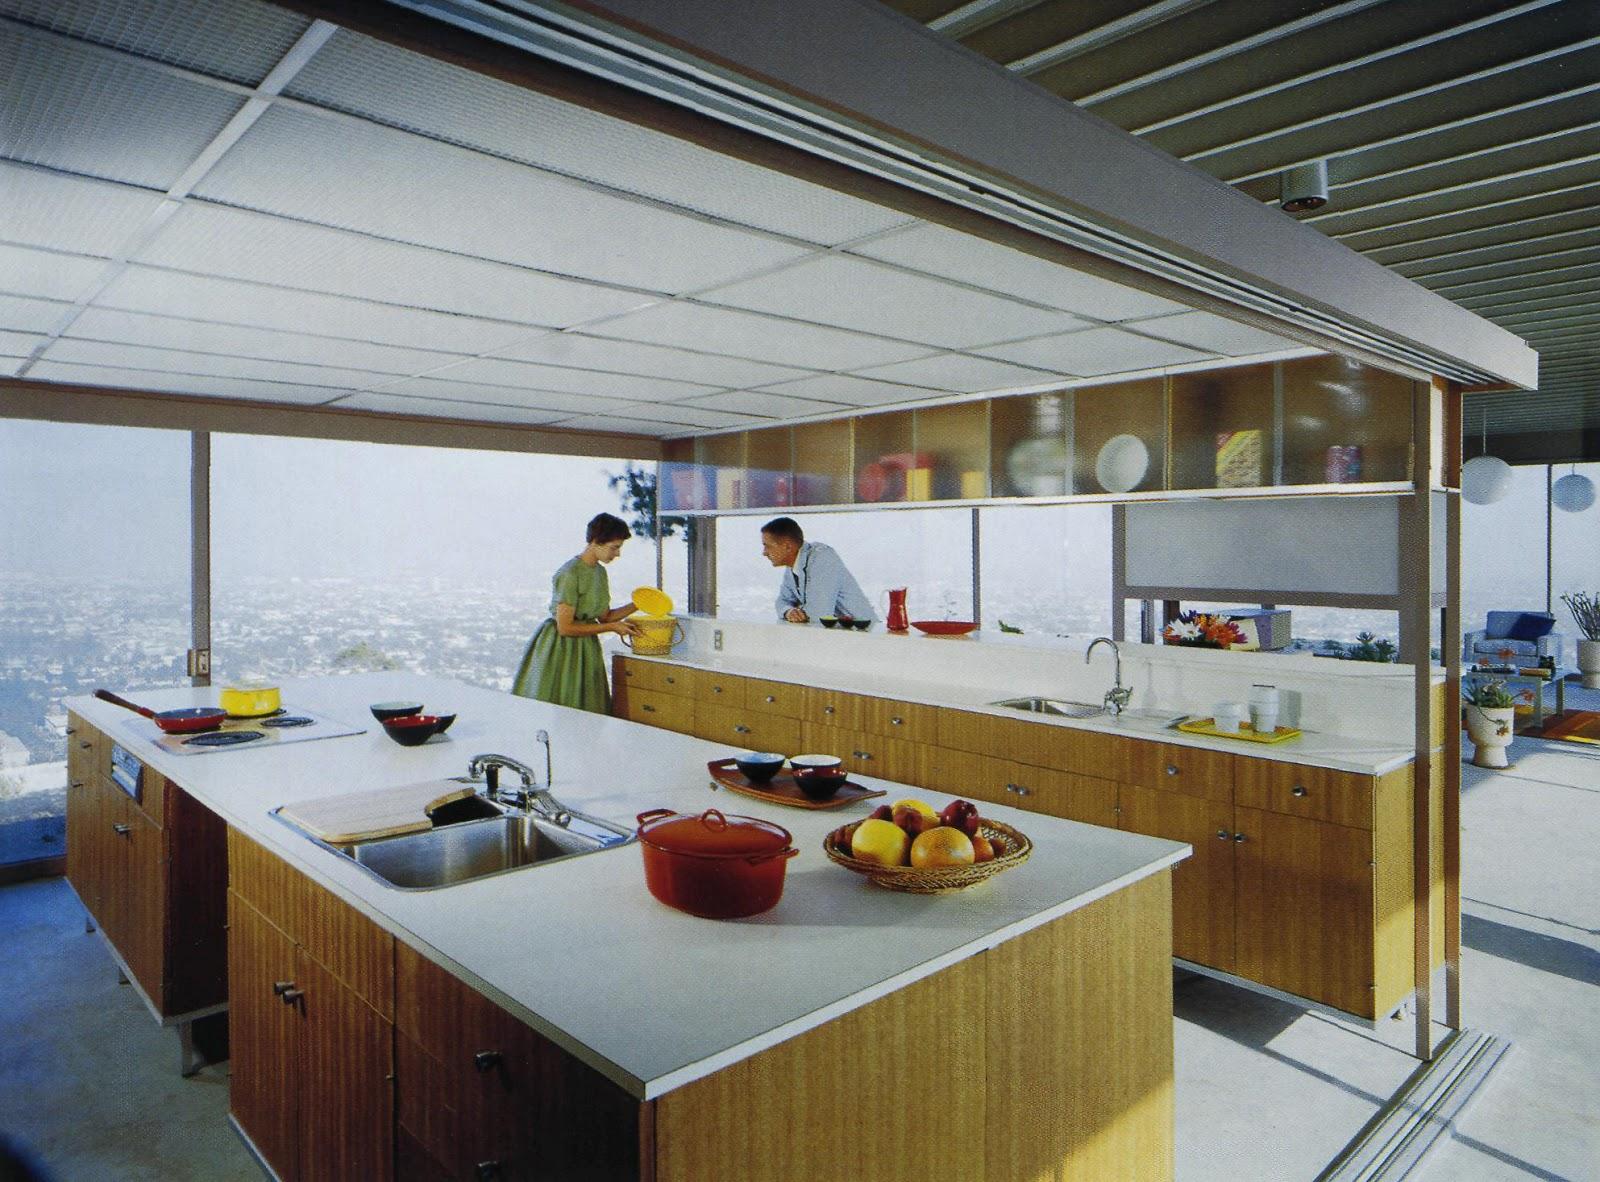 Case study house model 22 pierre koenig architecture for Design in casa